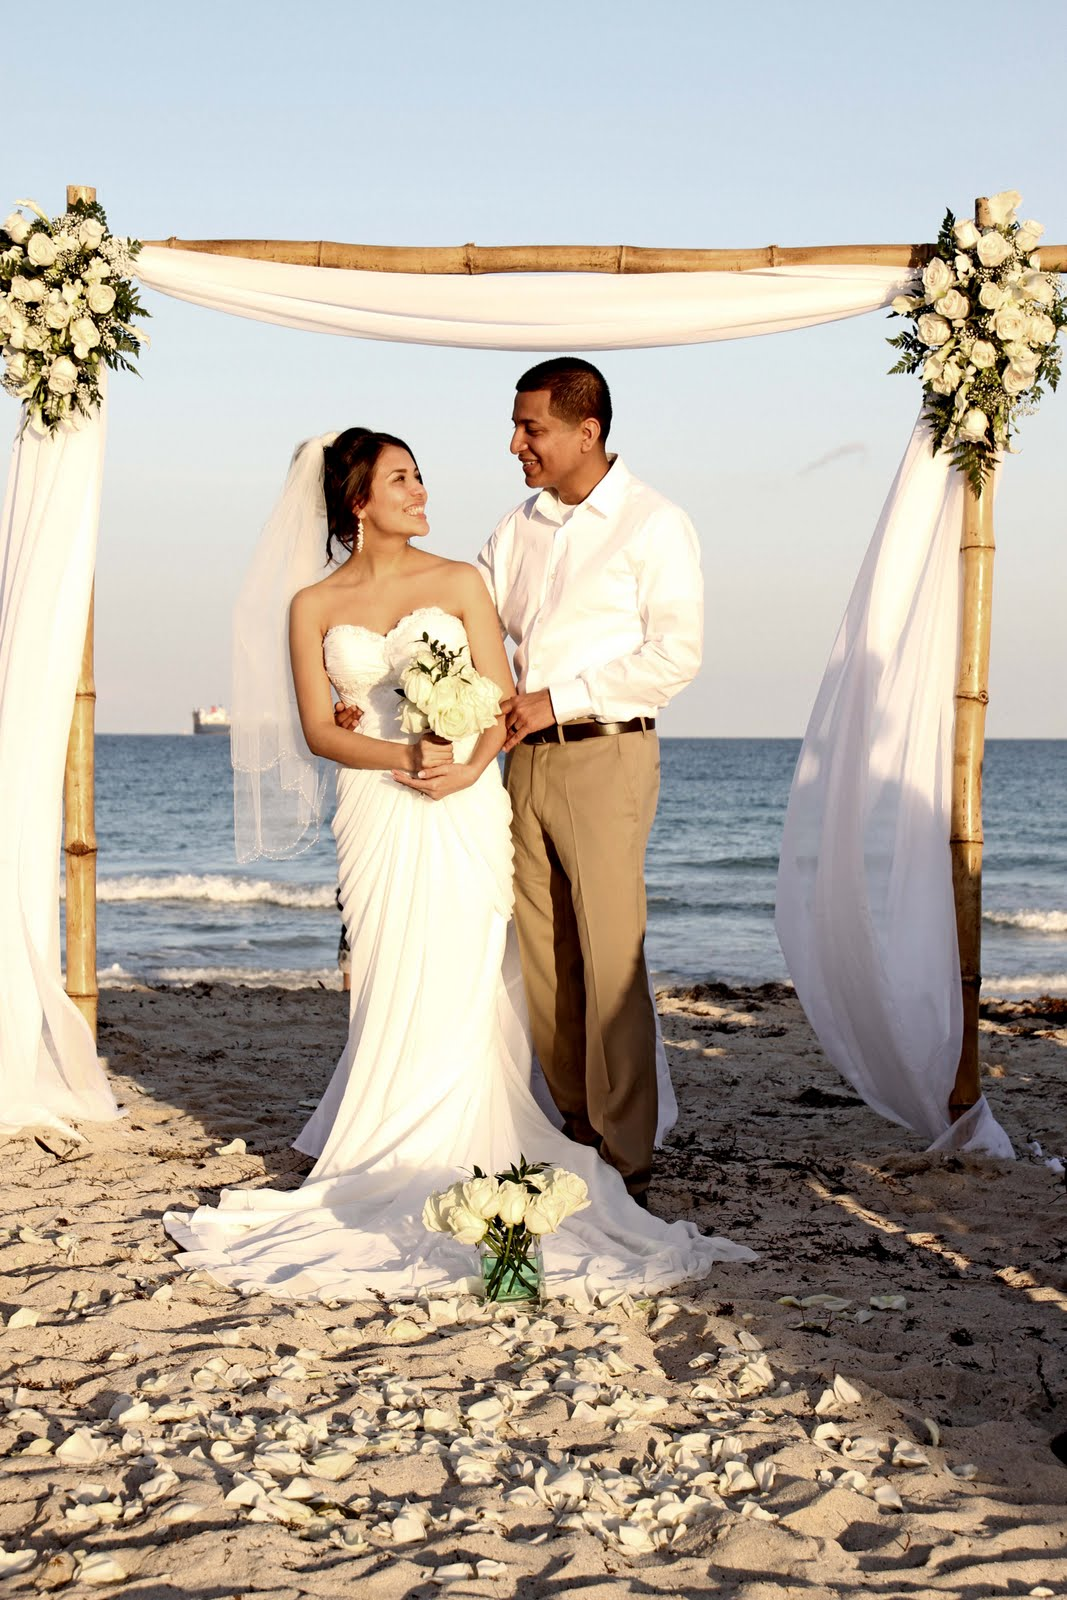 Affordable Beach Weddings 3057934387 Evelyn  Juans Miami Beach Wedding  South Pointe Park